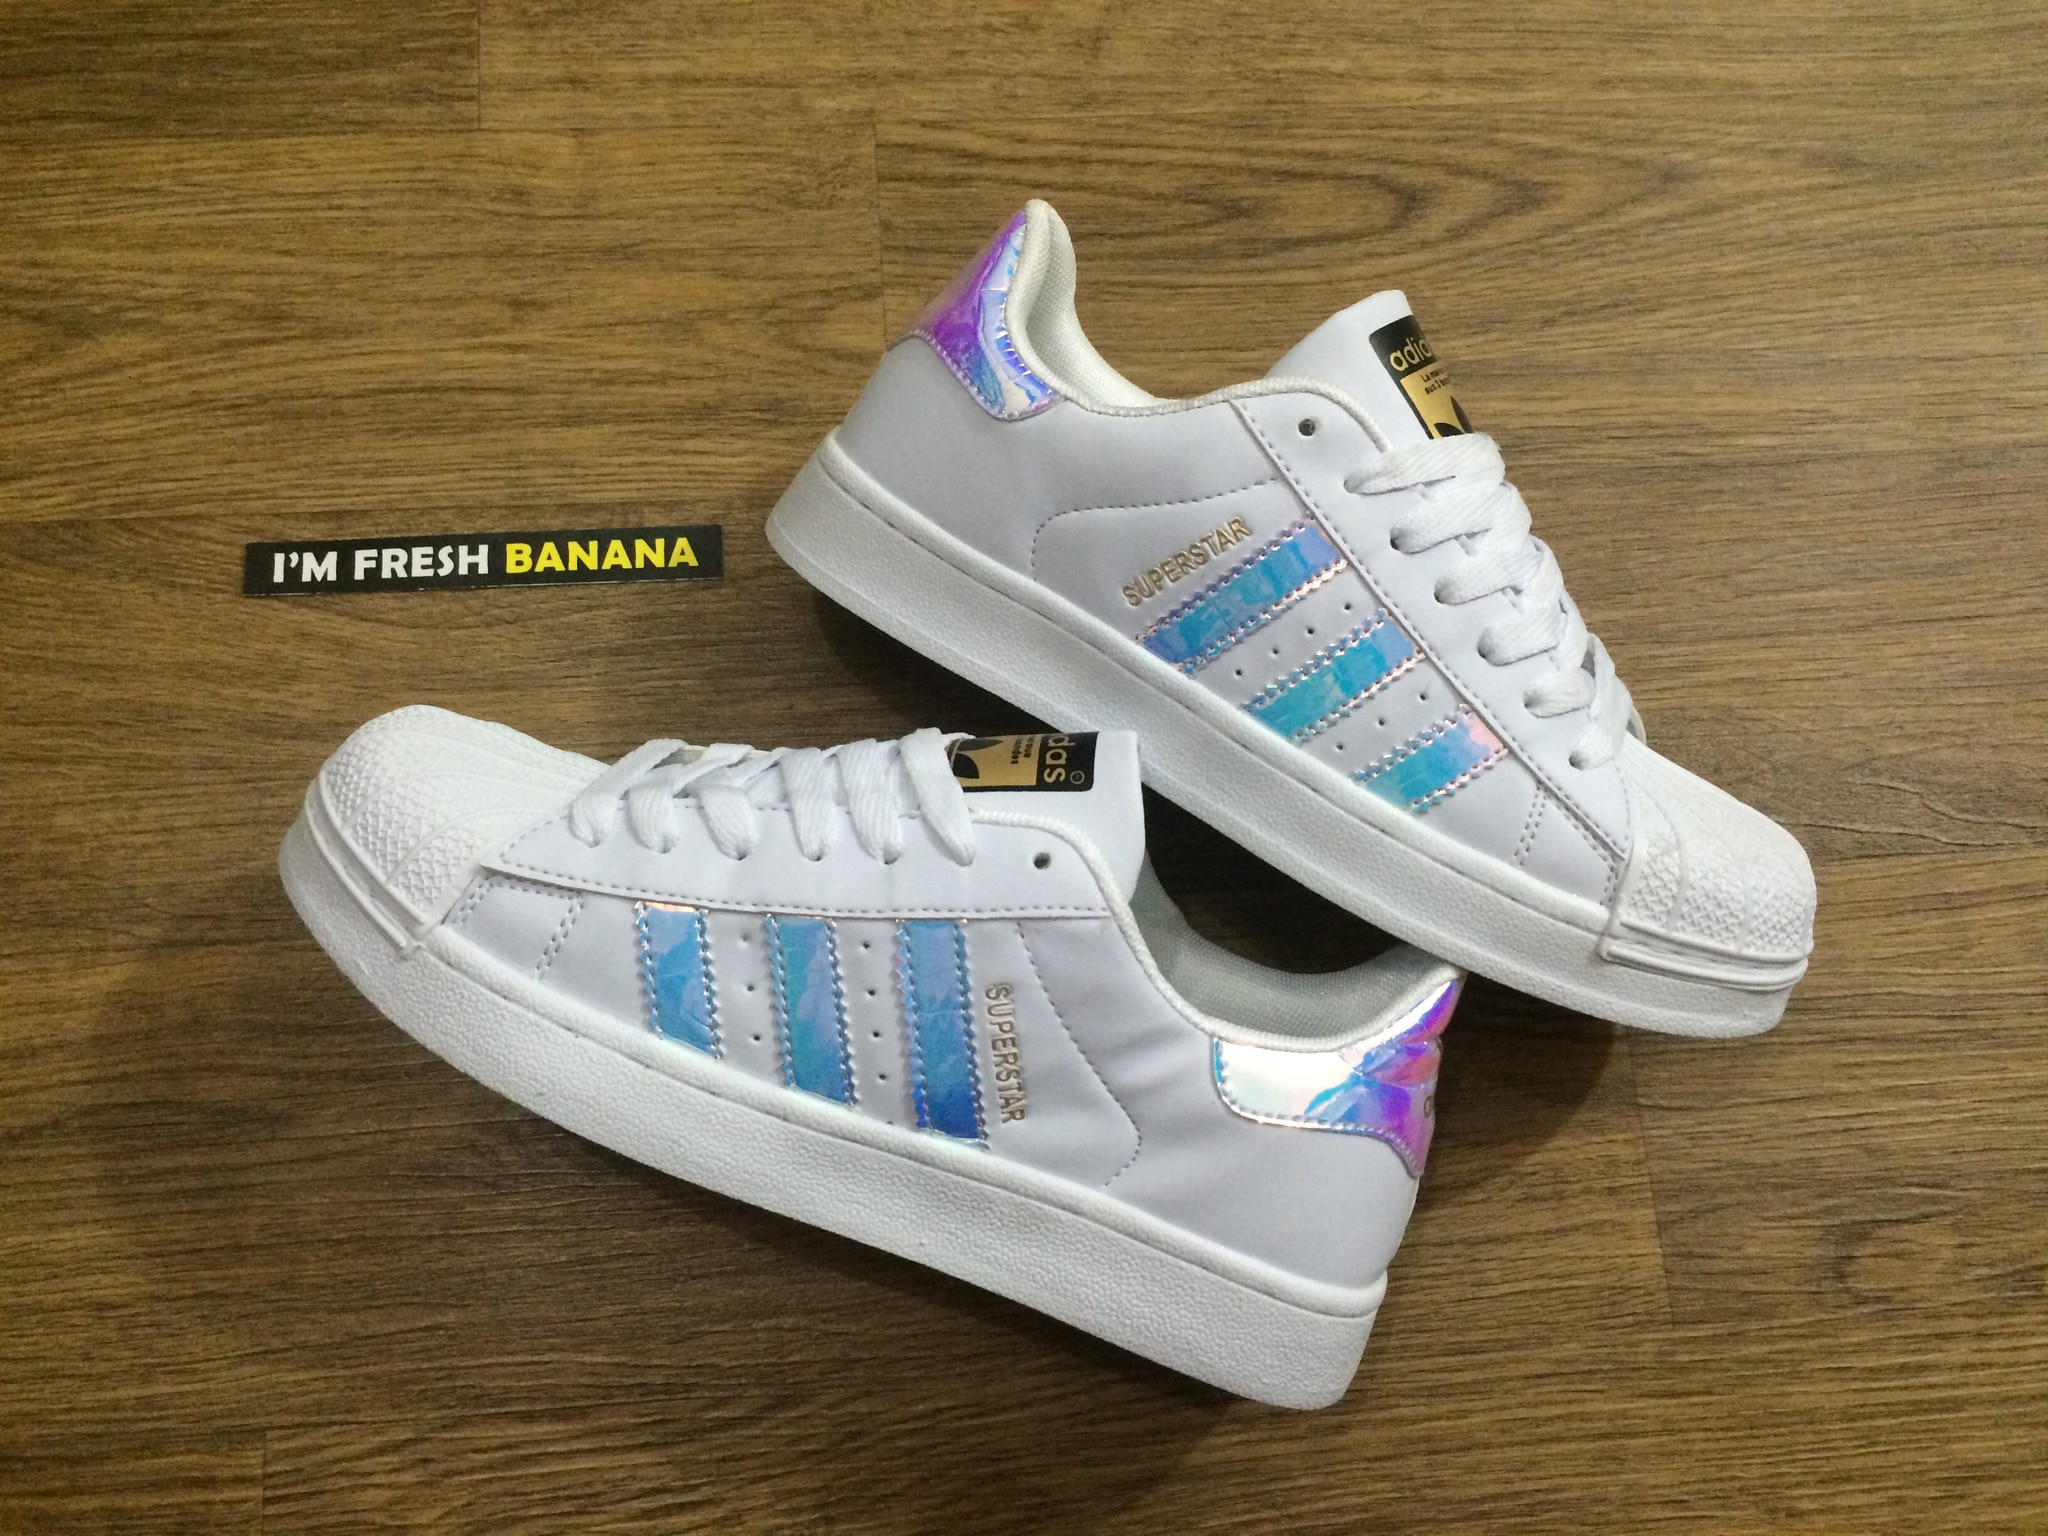 ... norway sepatu adidas superstar hologram import jual sepatu adidas  superstar supercolor full white hologram iridescent yyudistira 4001a534dd